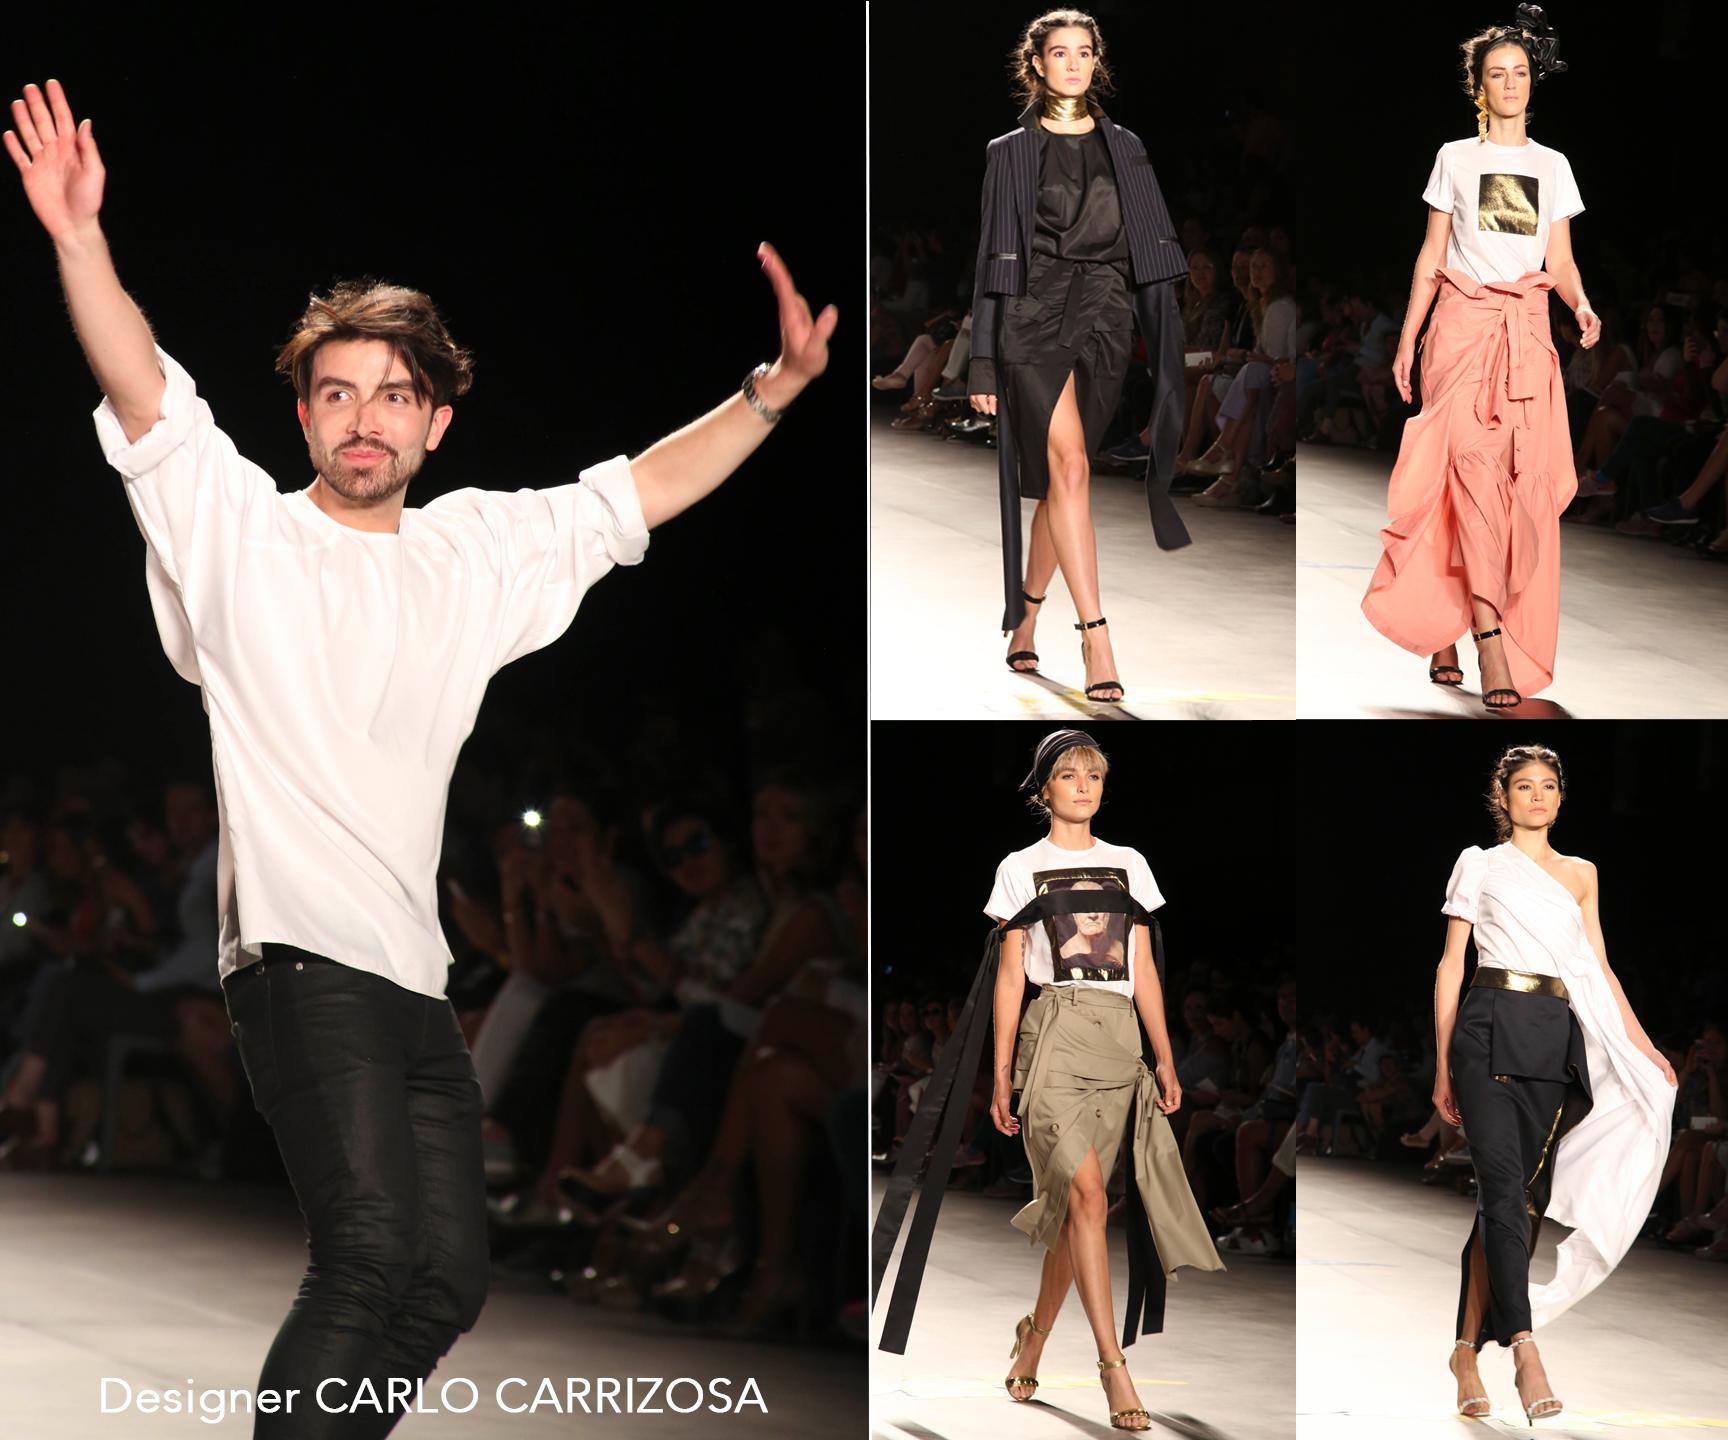 Colombian Designers - Carlo Carrizosa